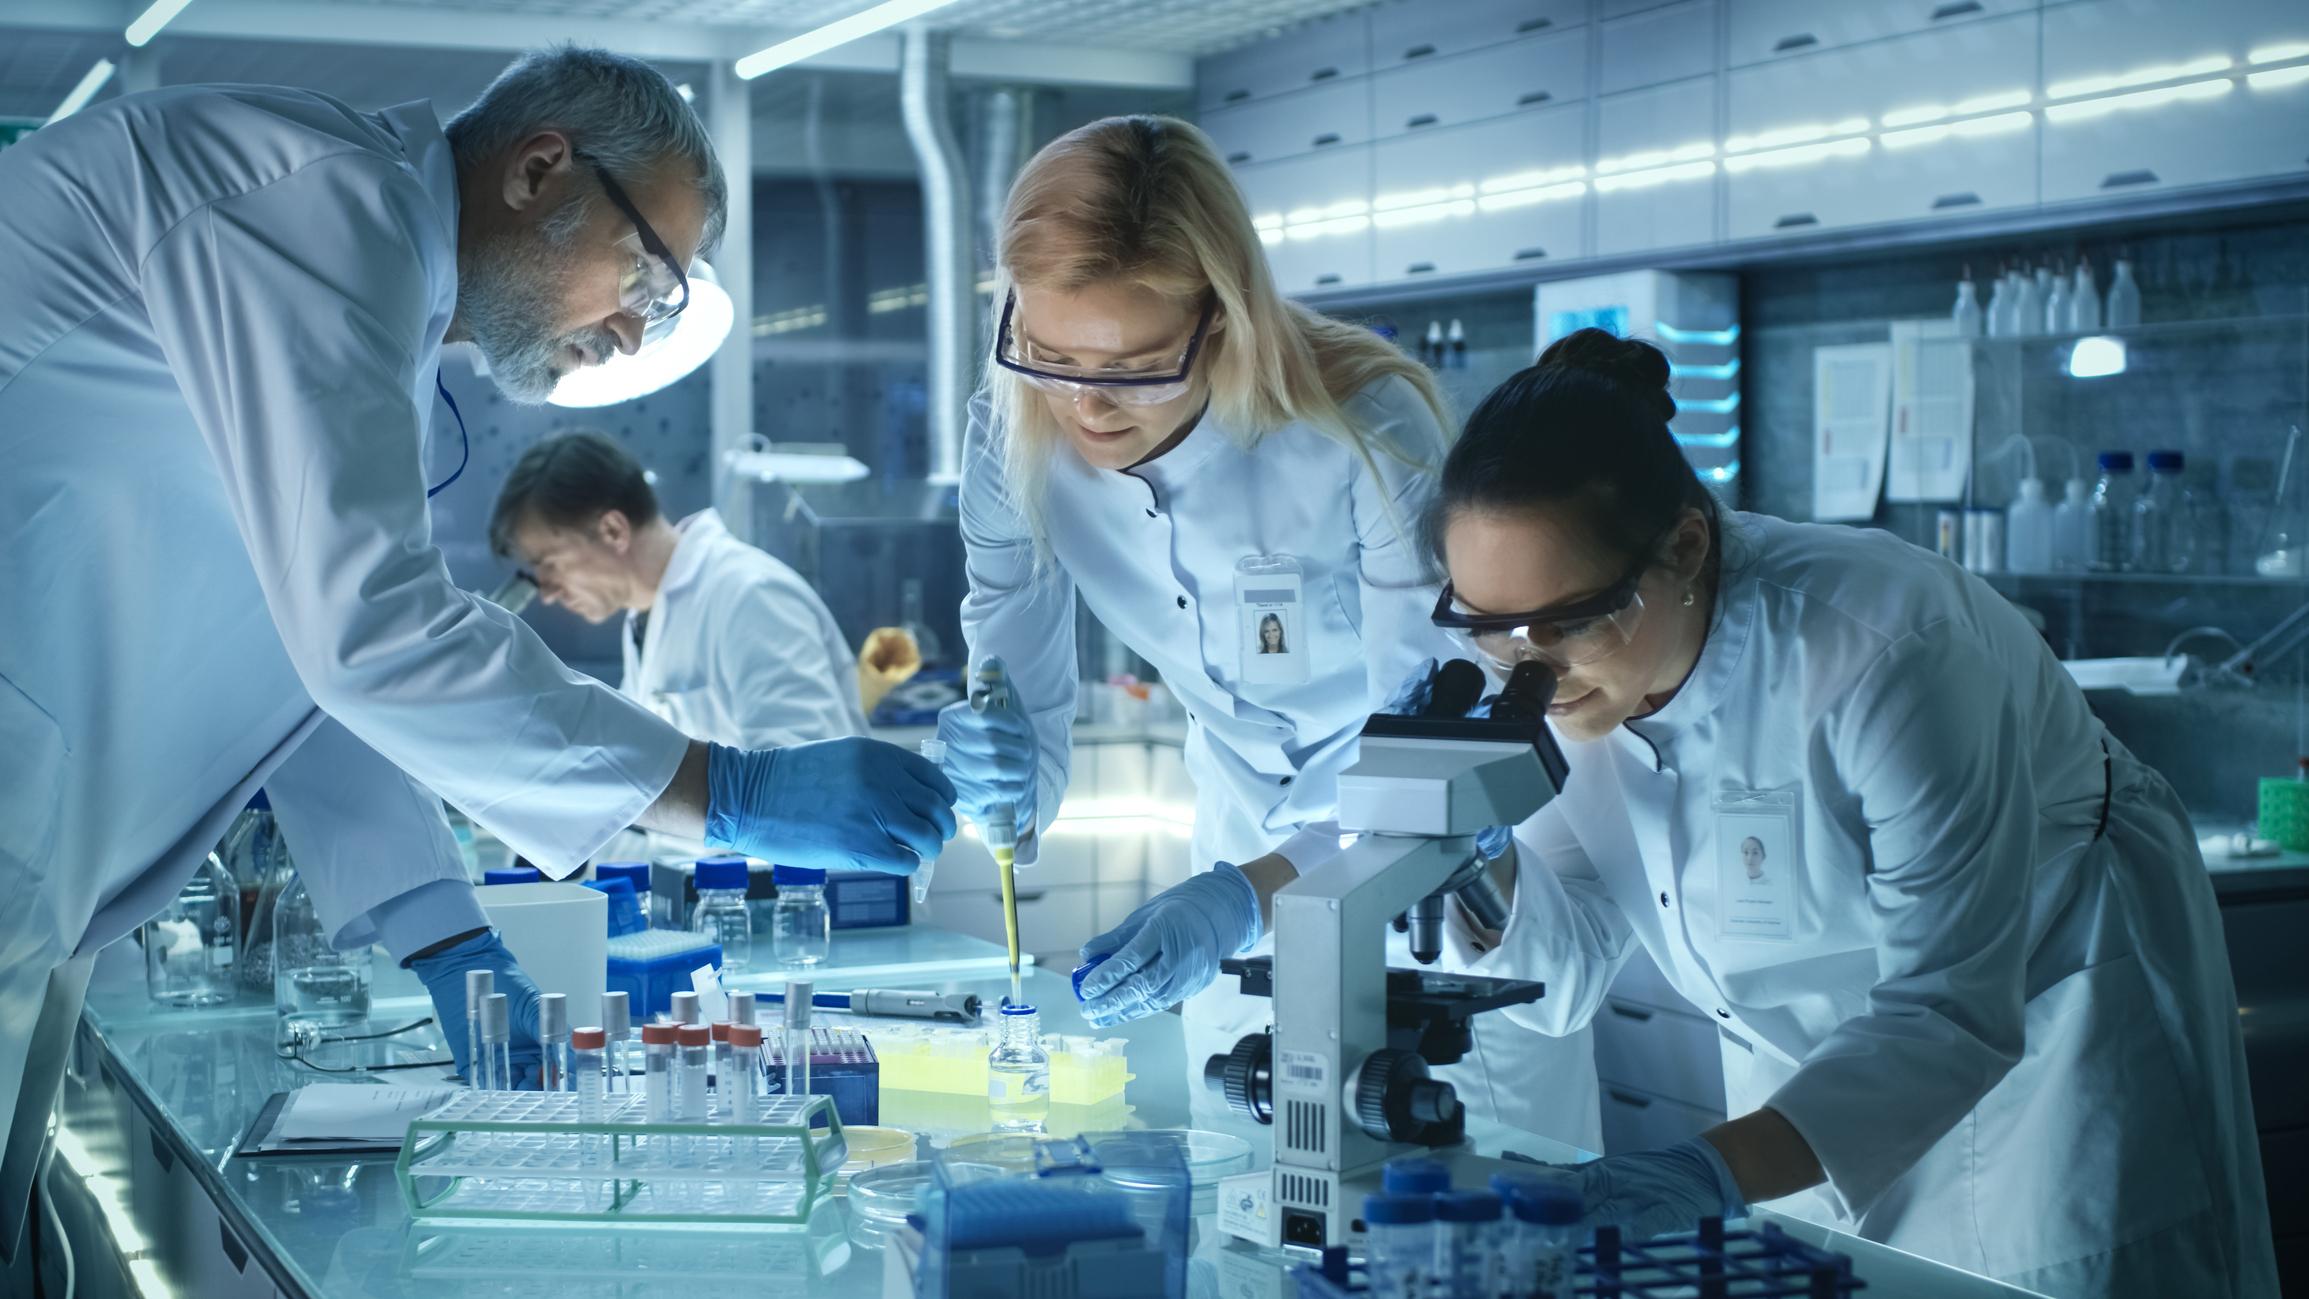 Labatory researchers examine a specimen under a microscope.